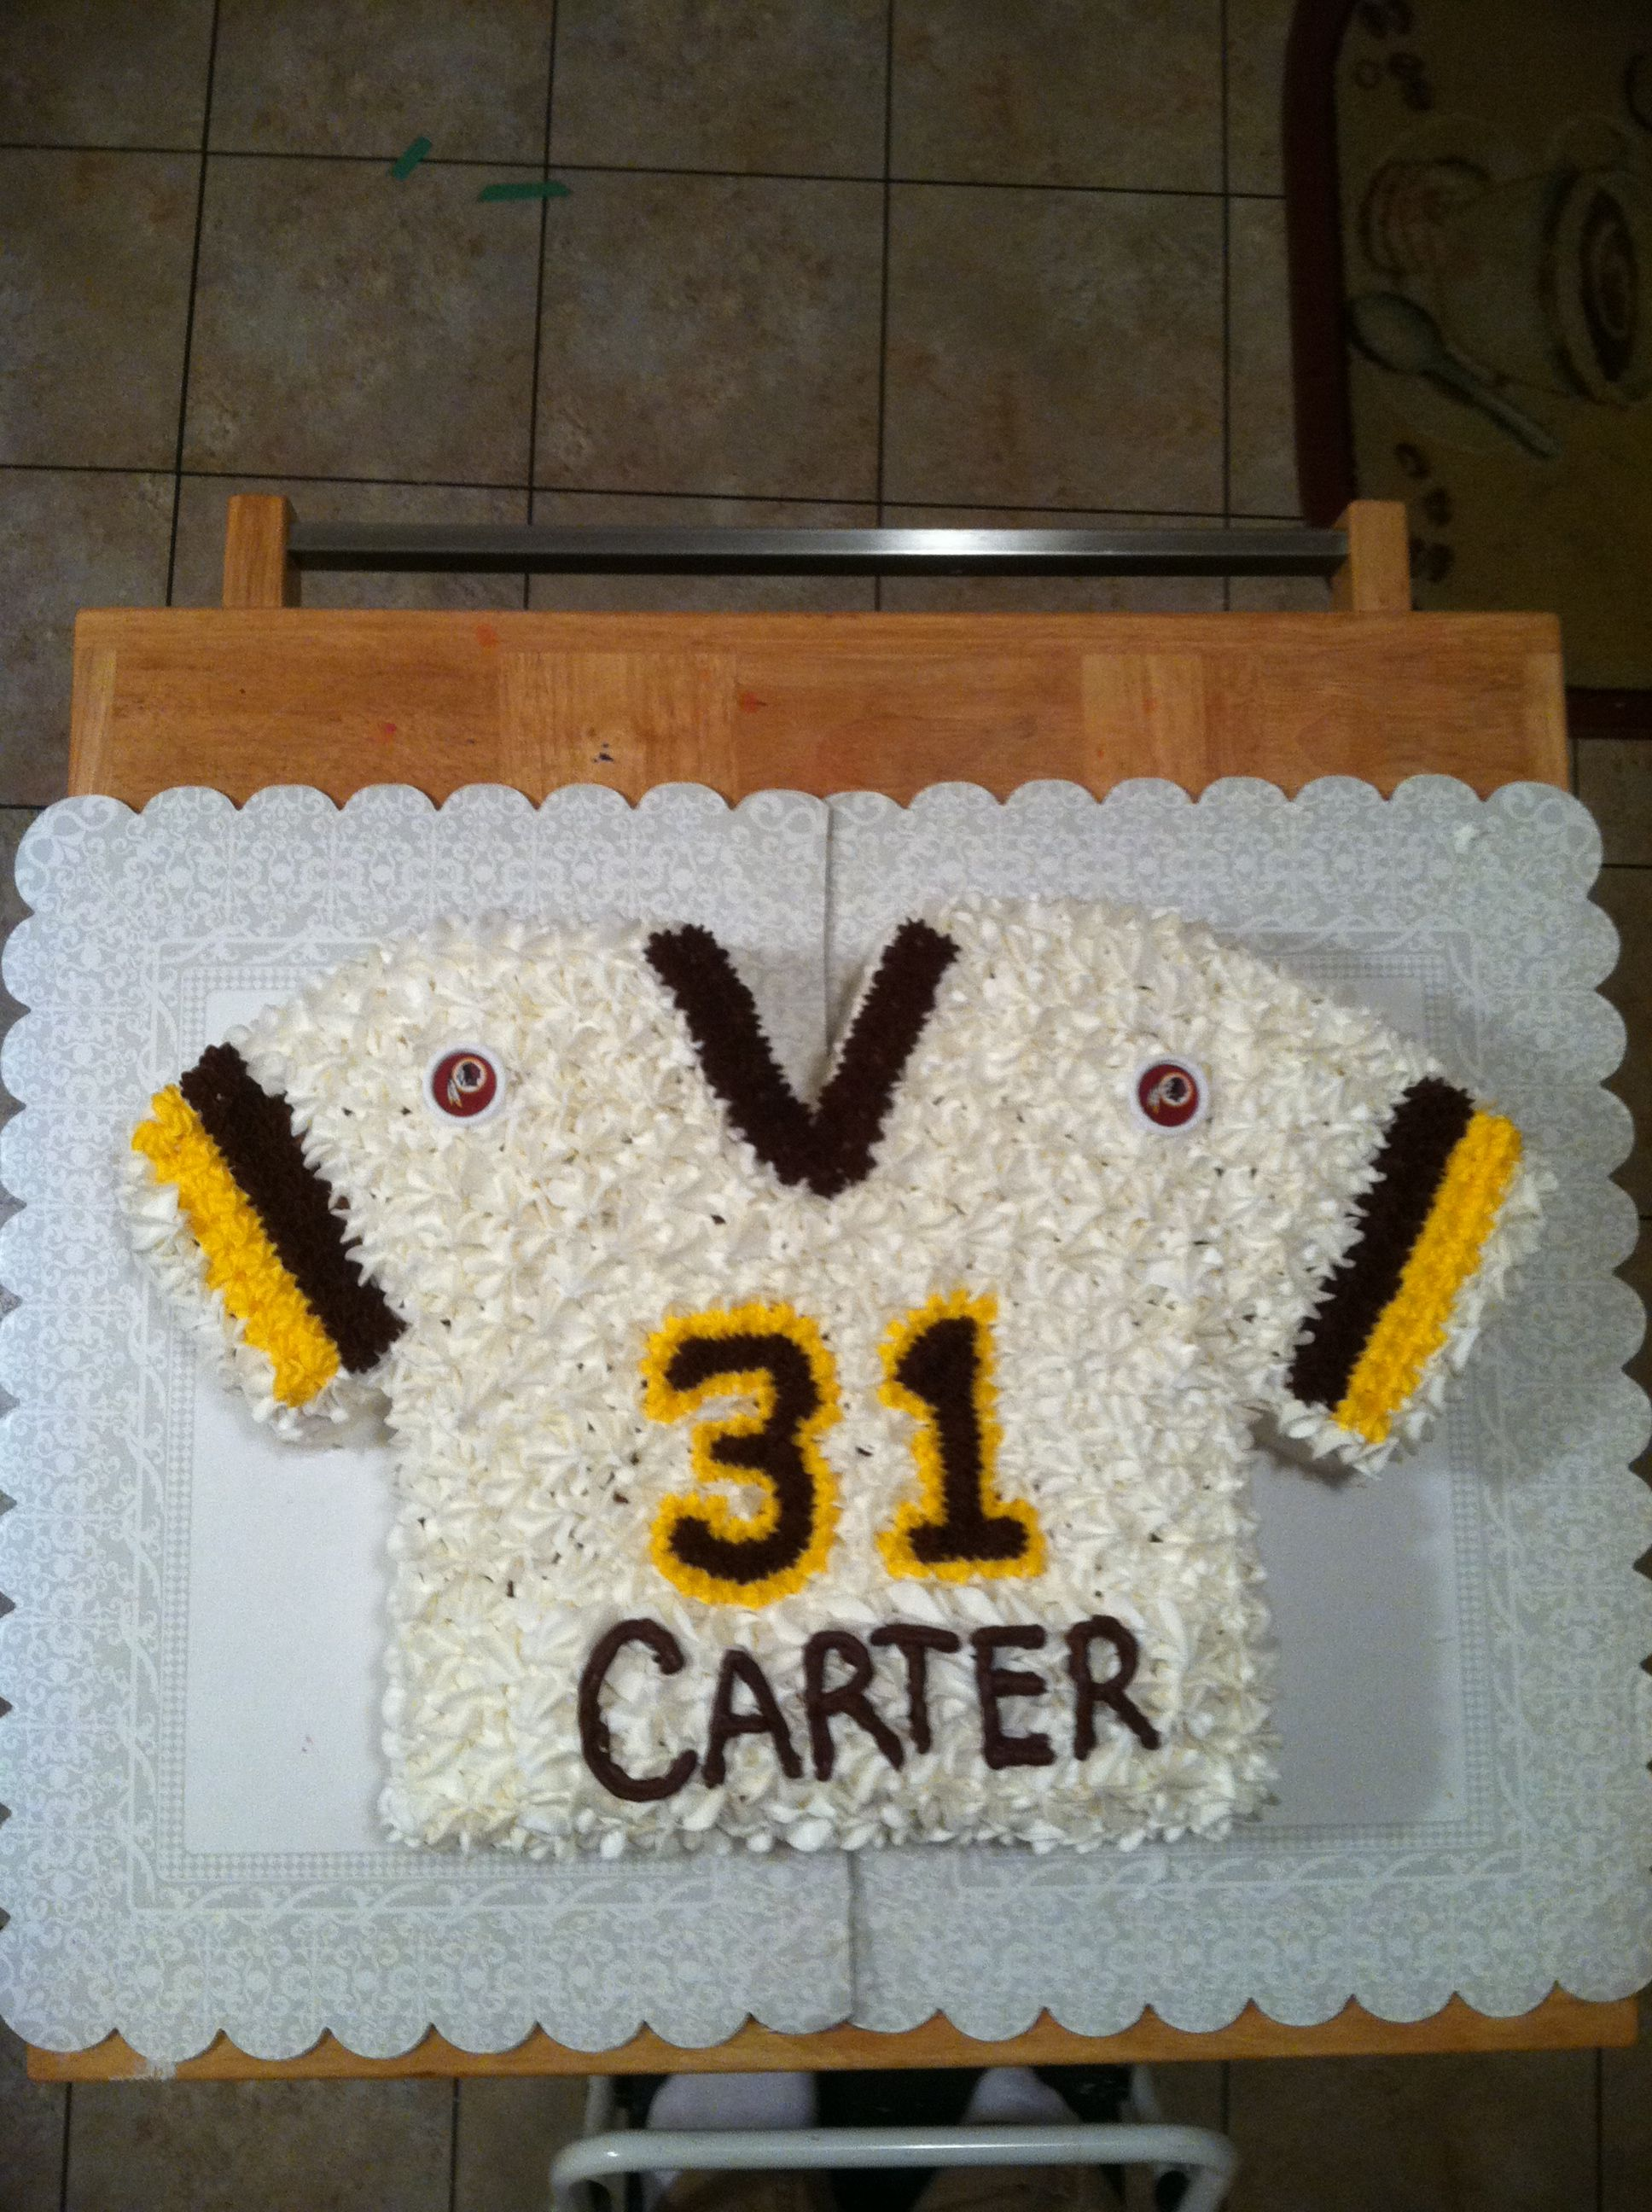 Jersey cake cake creations cake desserts